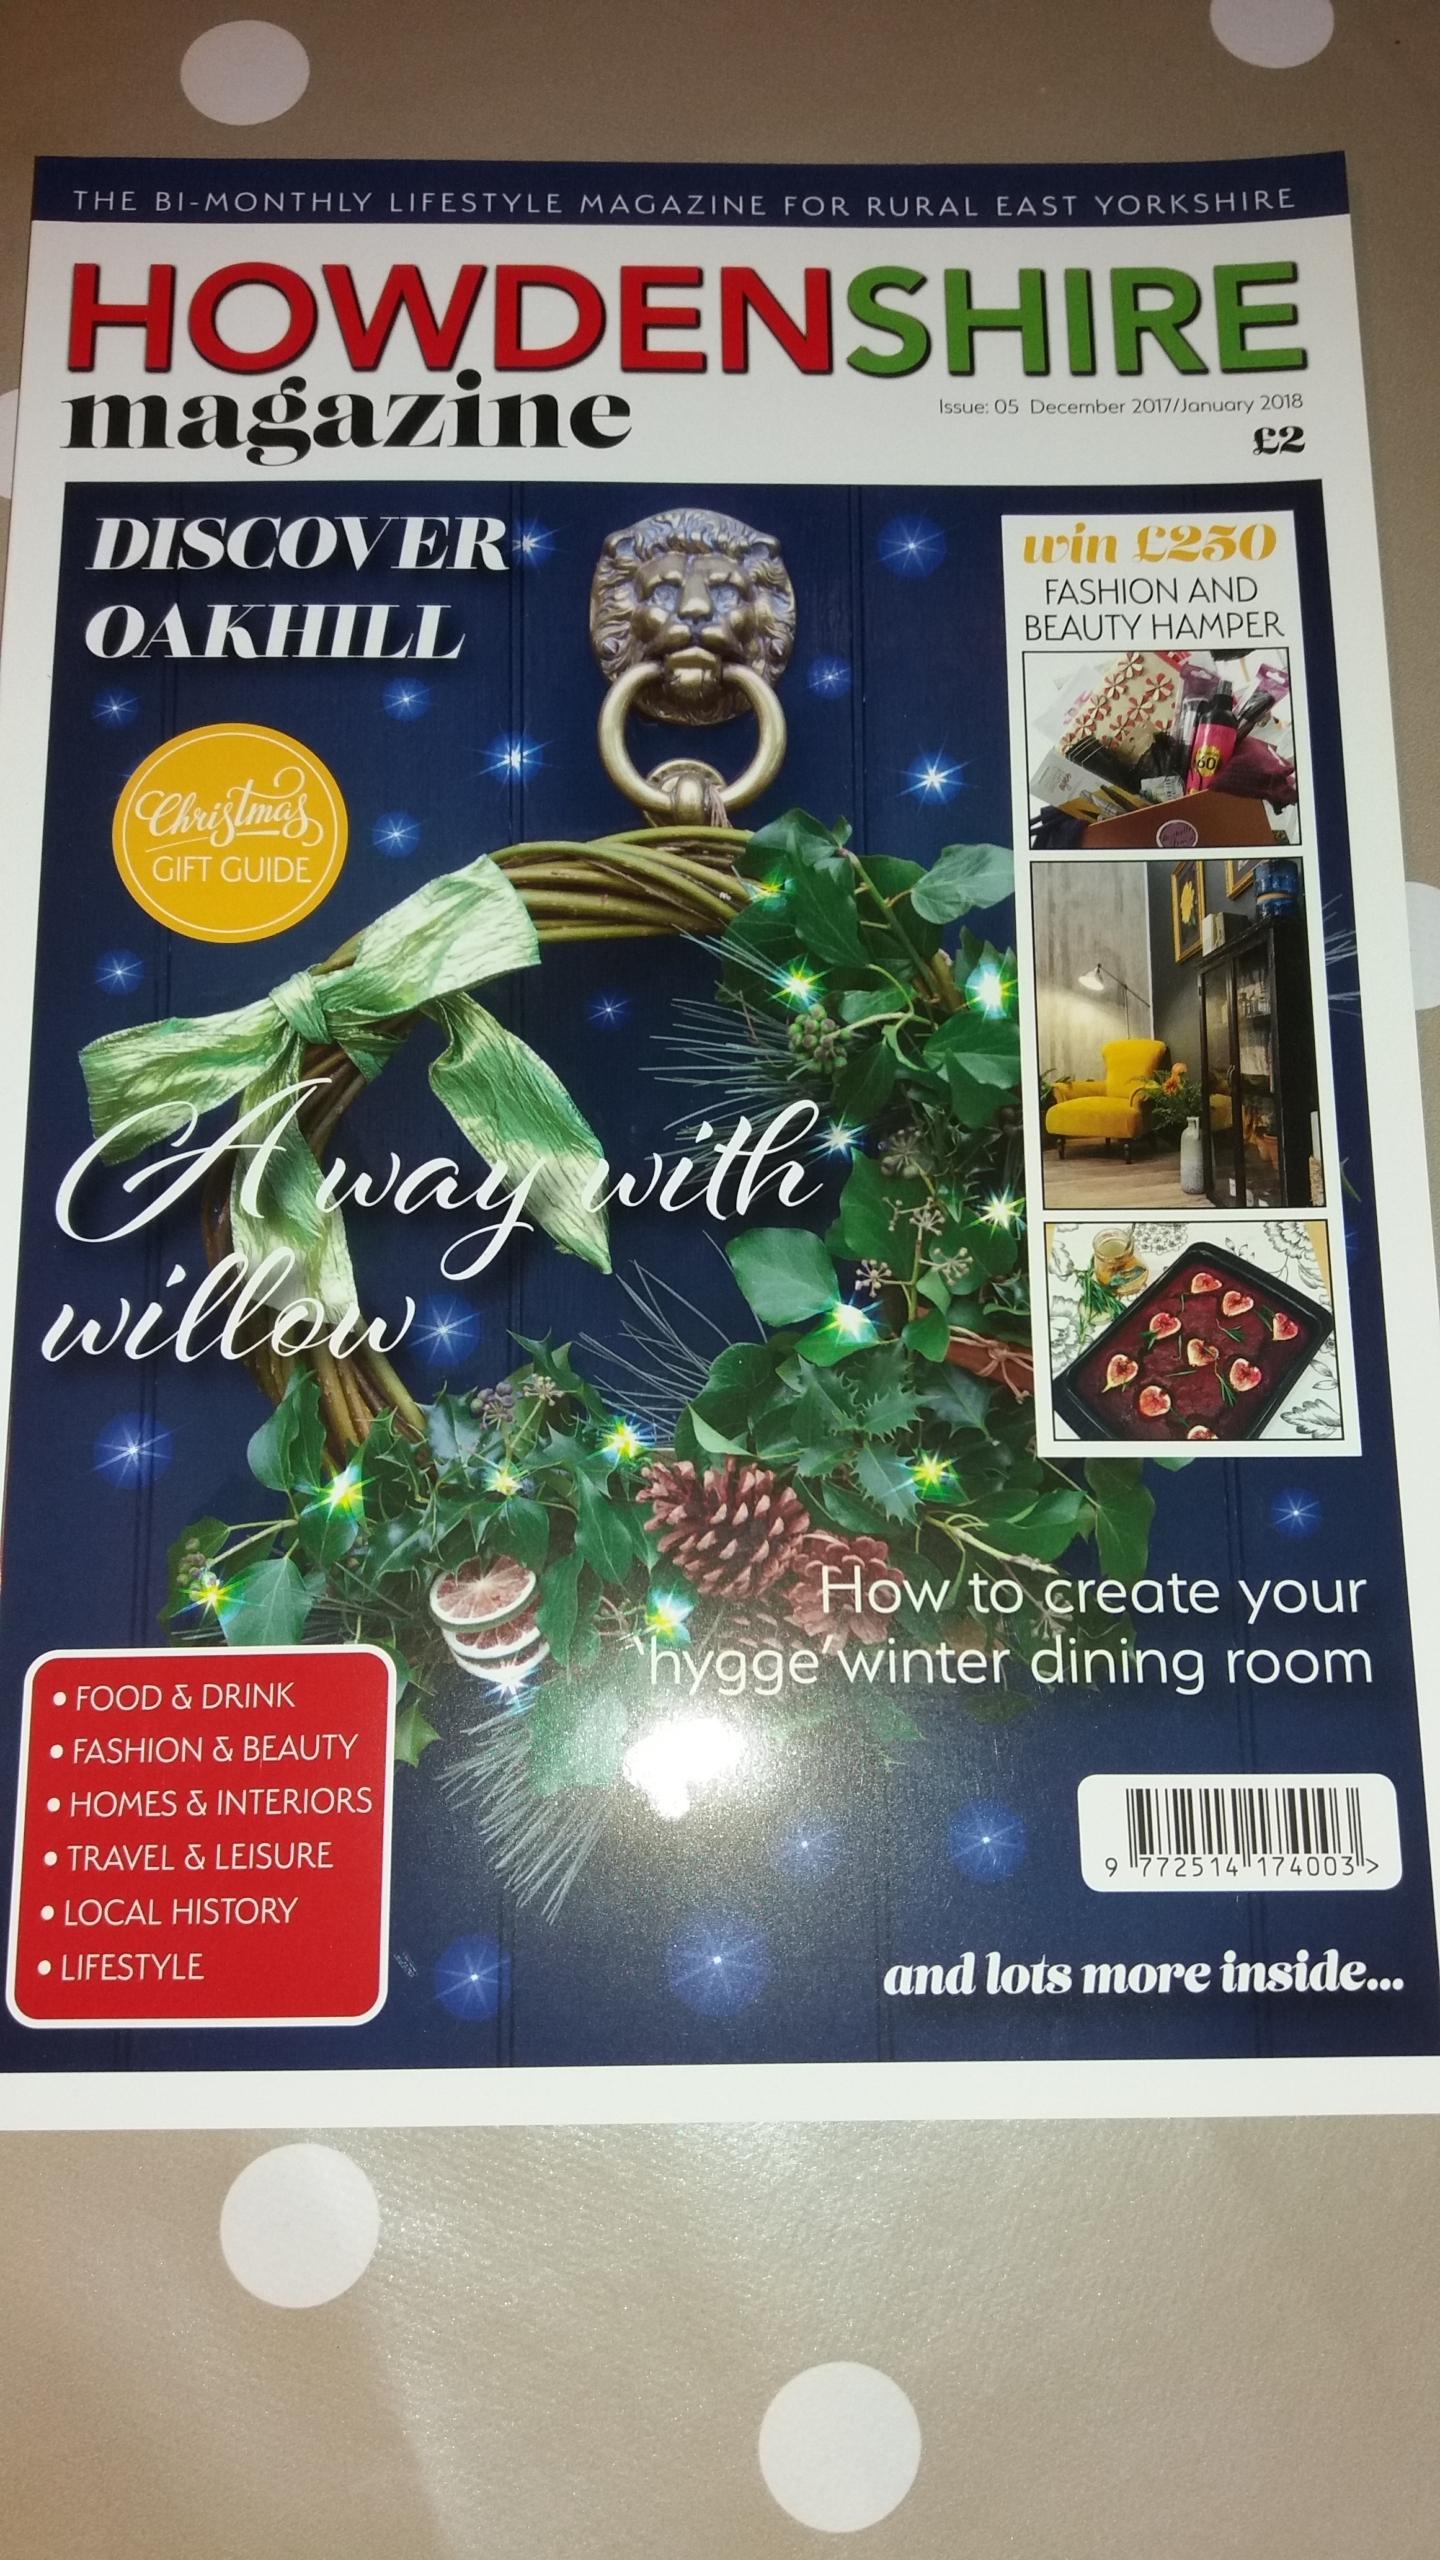 Howdenshire Magazine